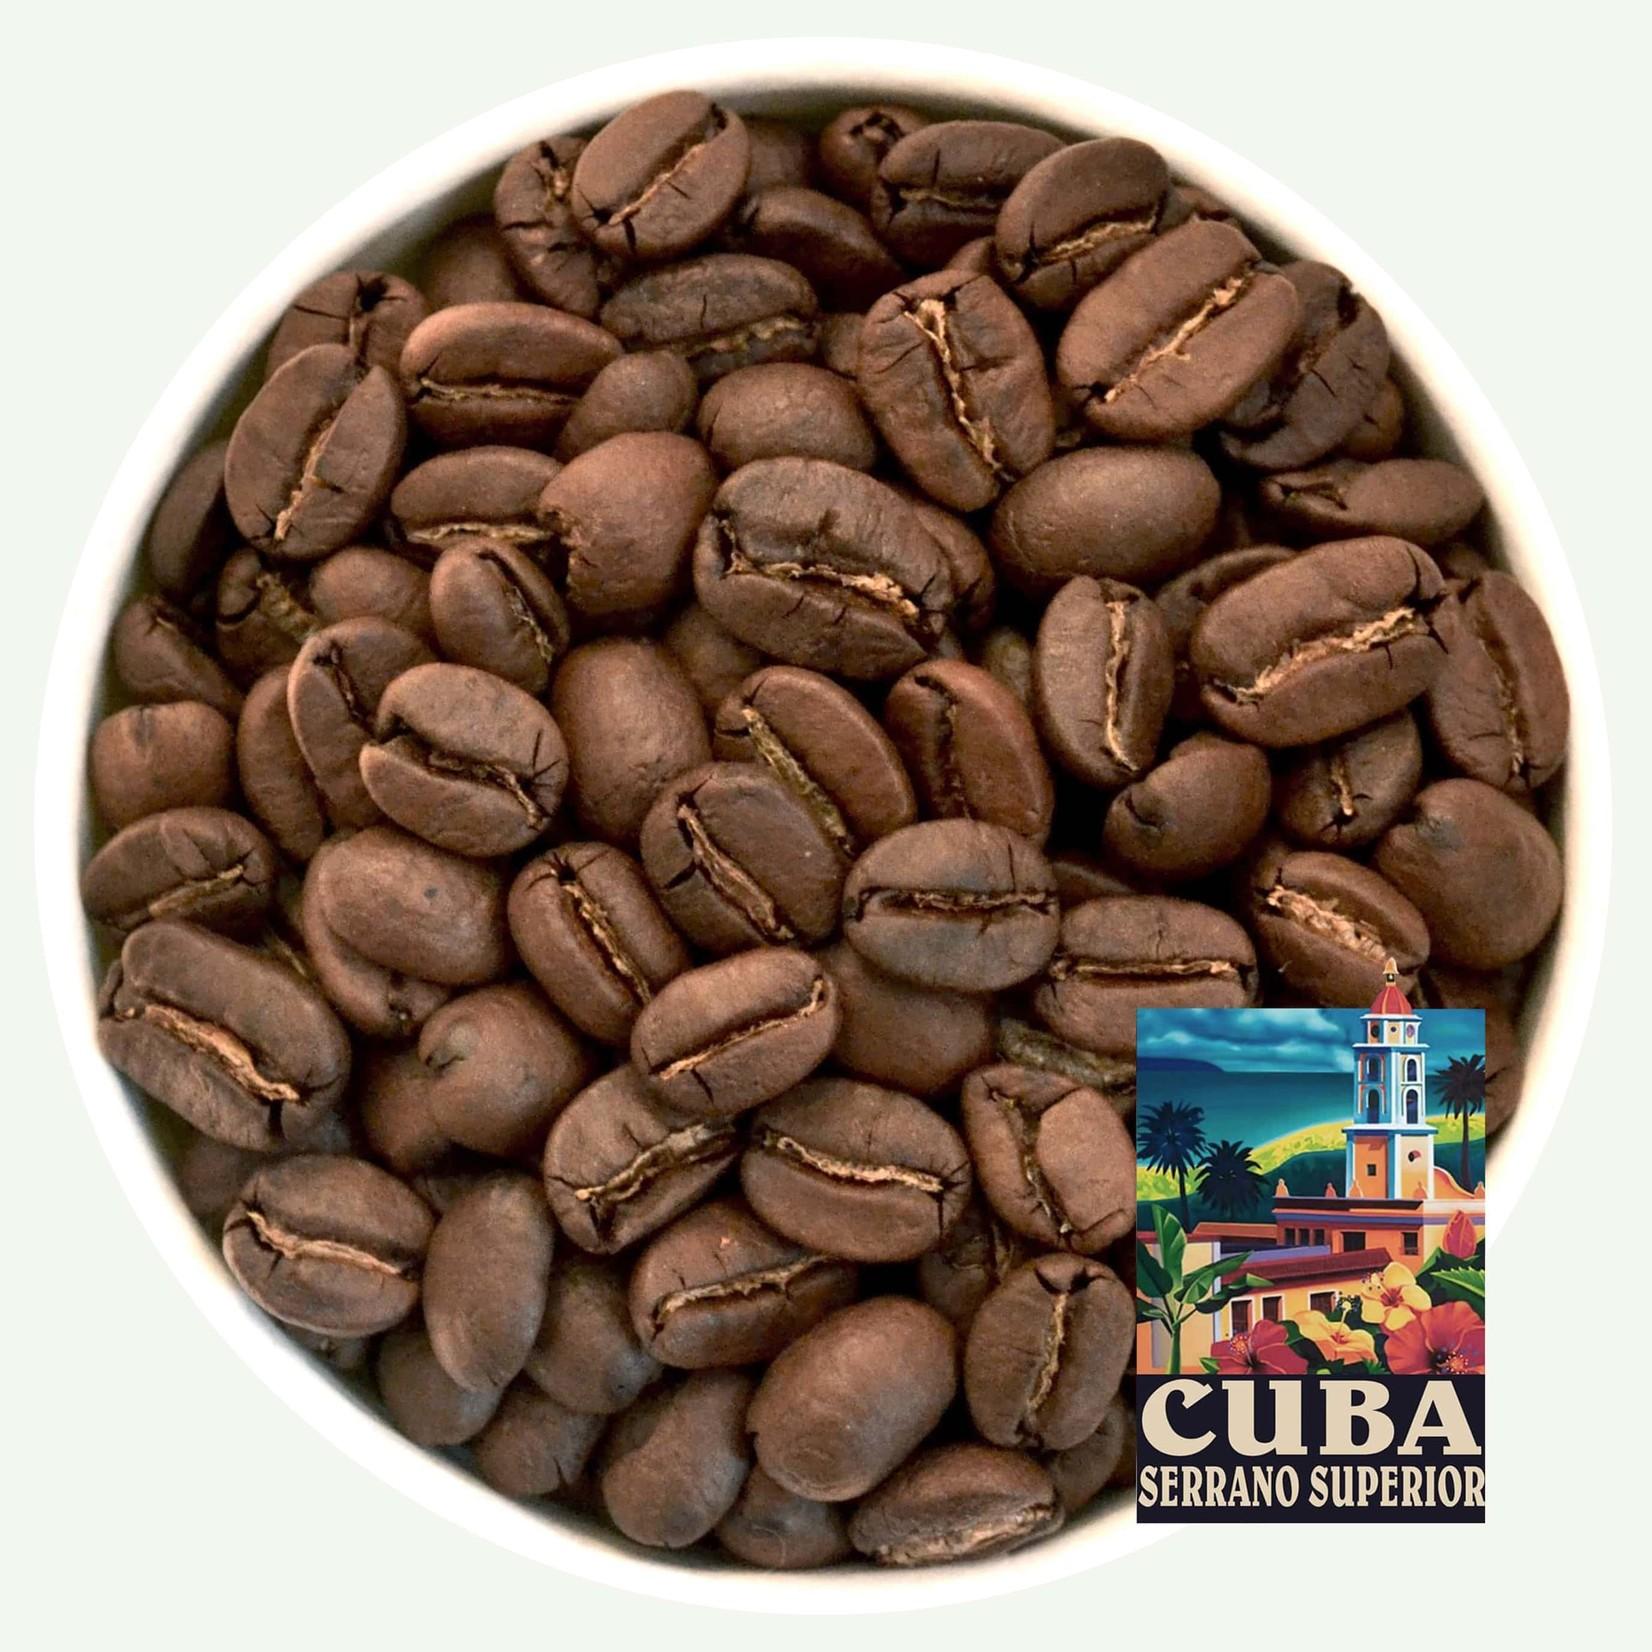 Koffiebranderij Sao Paulo Cuba 'Serrano Superior'